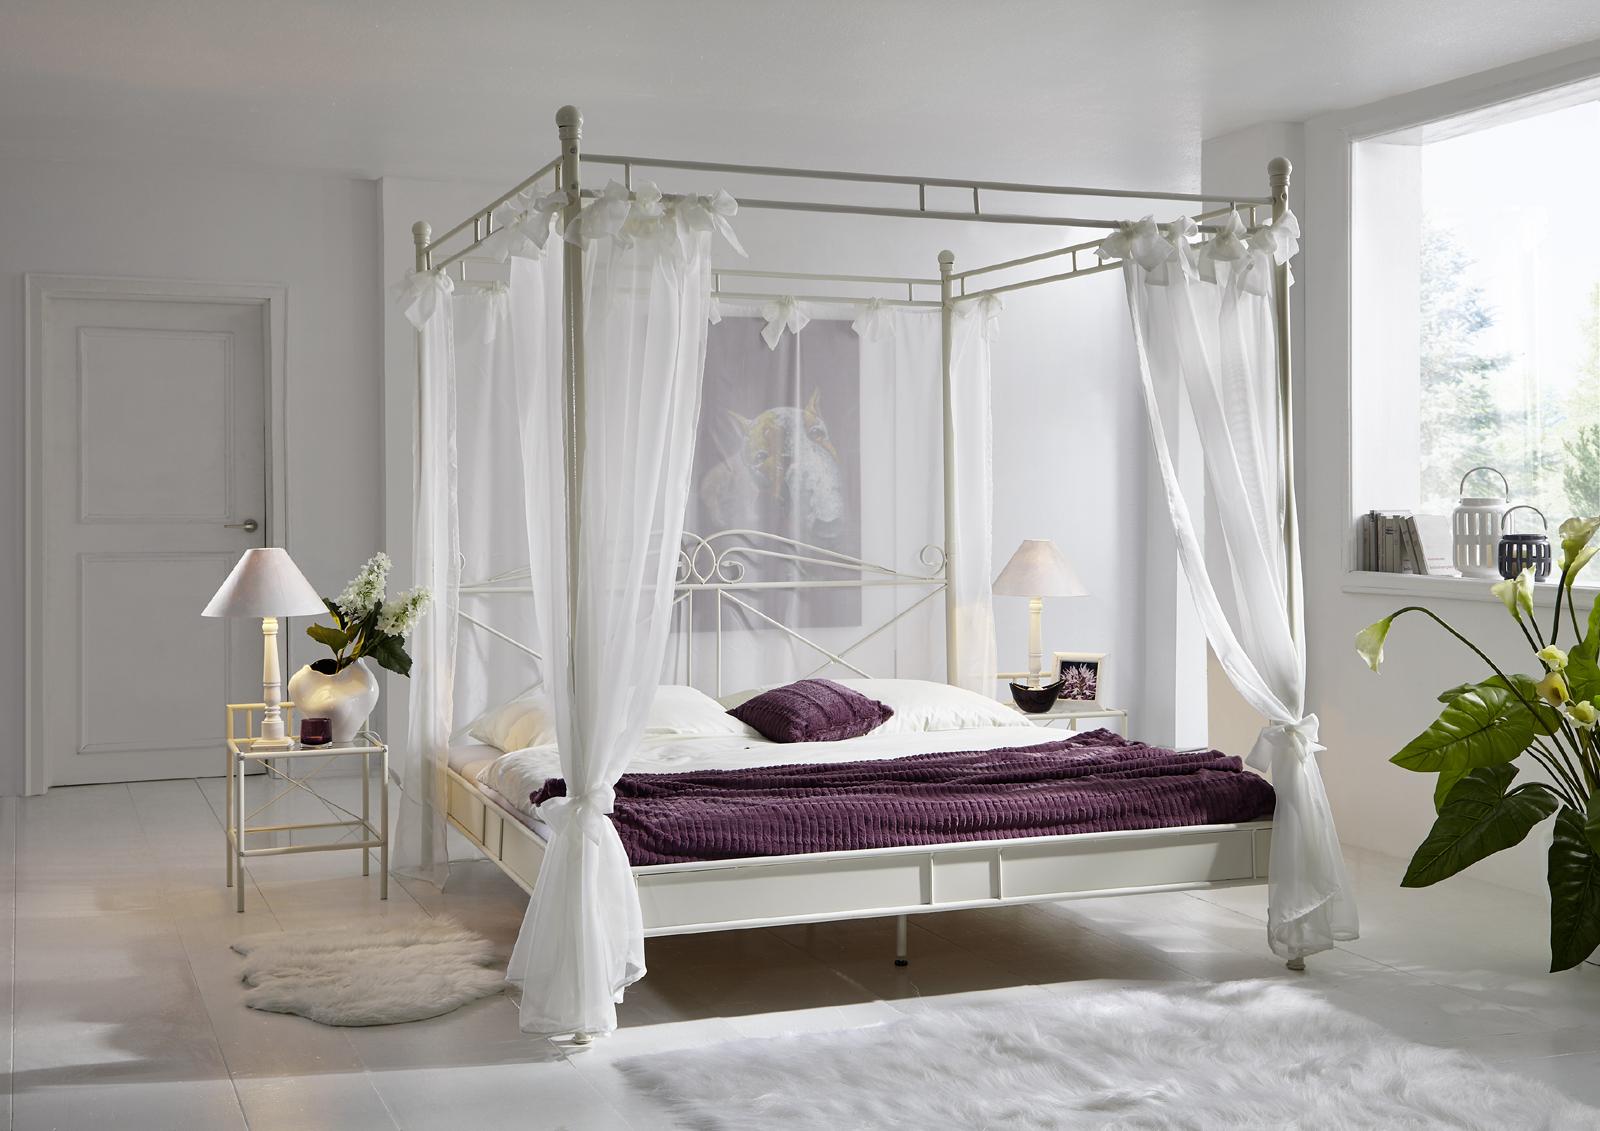 sam design himmelbett 140cm creme wei venezia. Black Bedroom Furniture Sets. Home Design Ideas